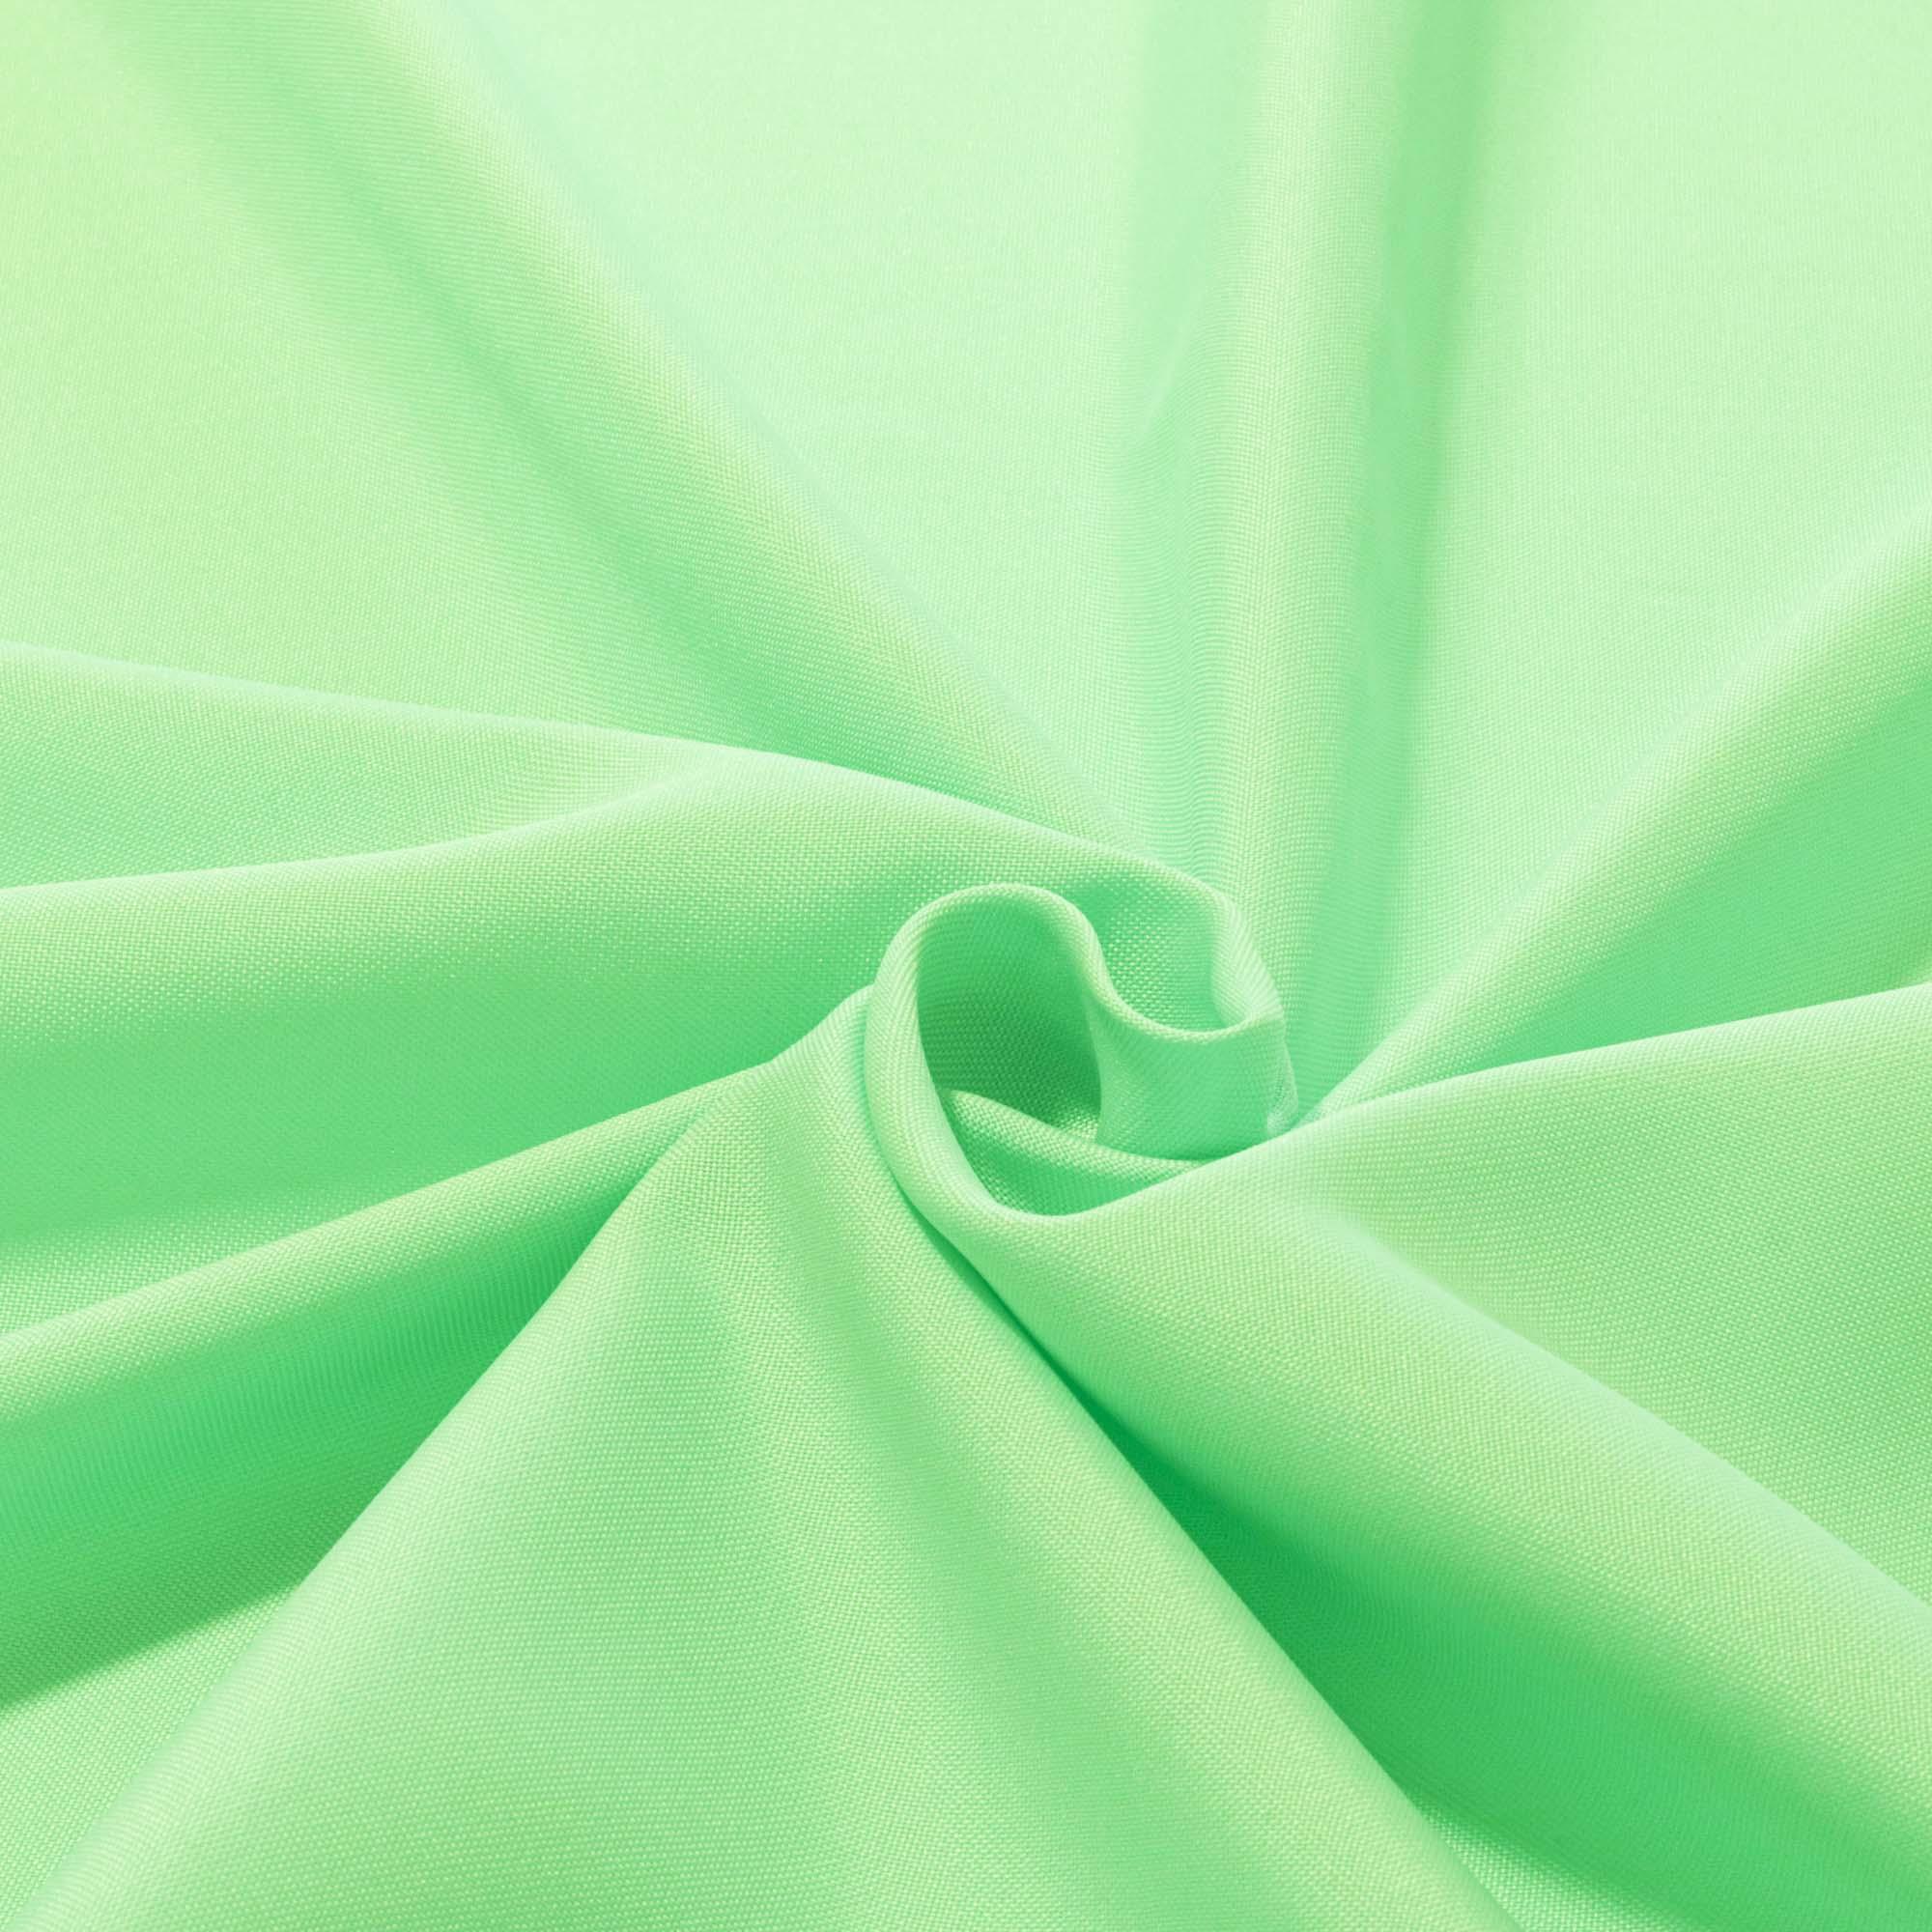 Tecido Oxford Liso 100% Poliester 1,50 m Largura Verde Piscina